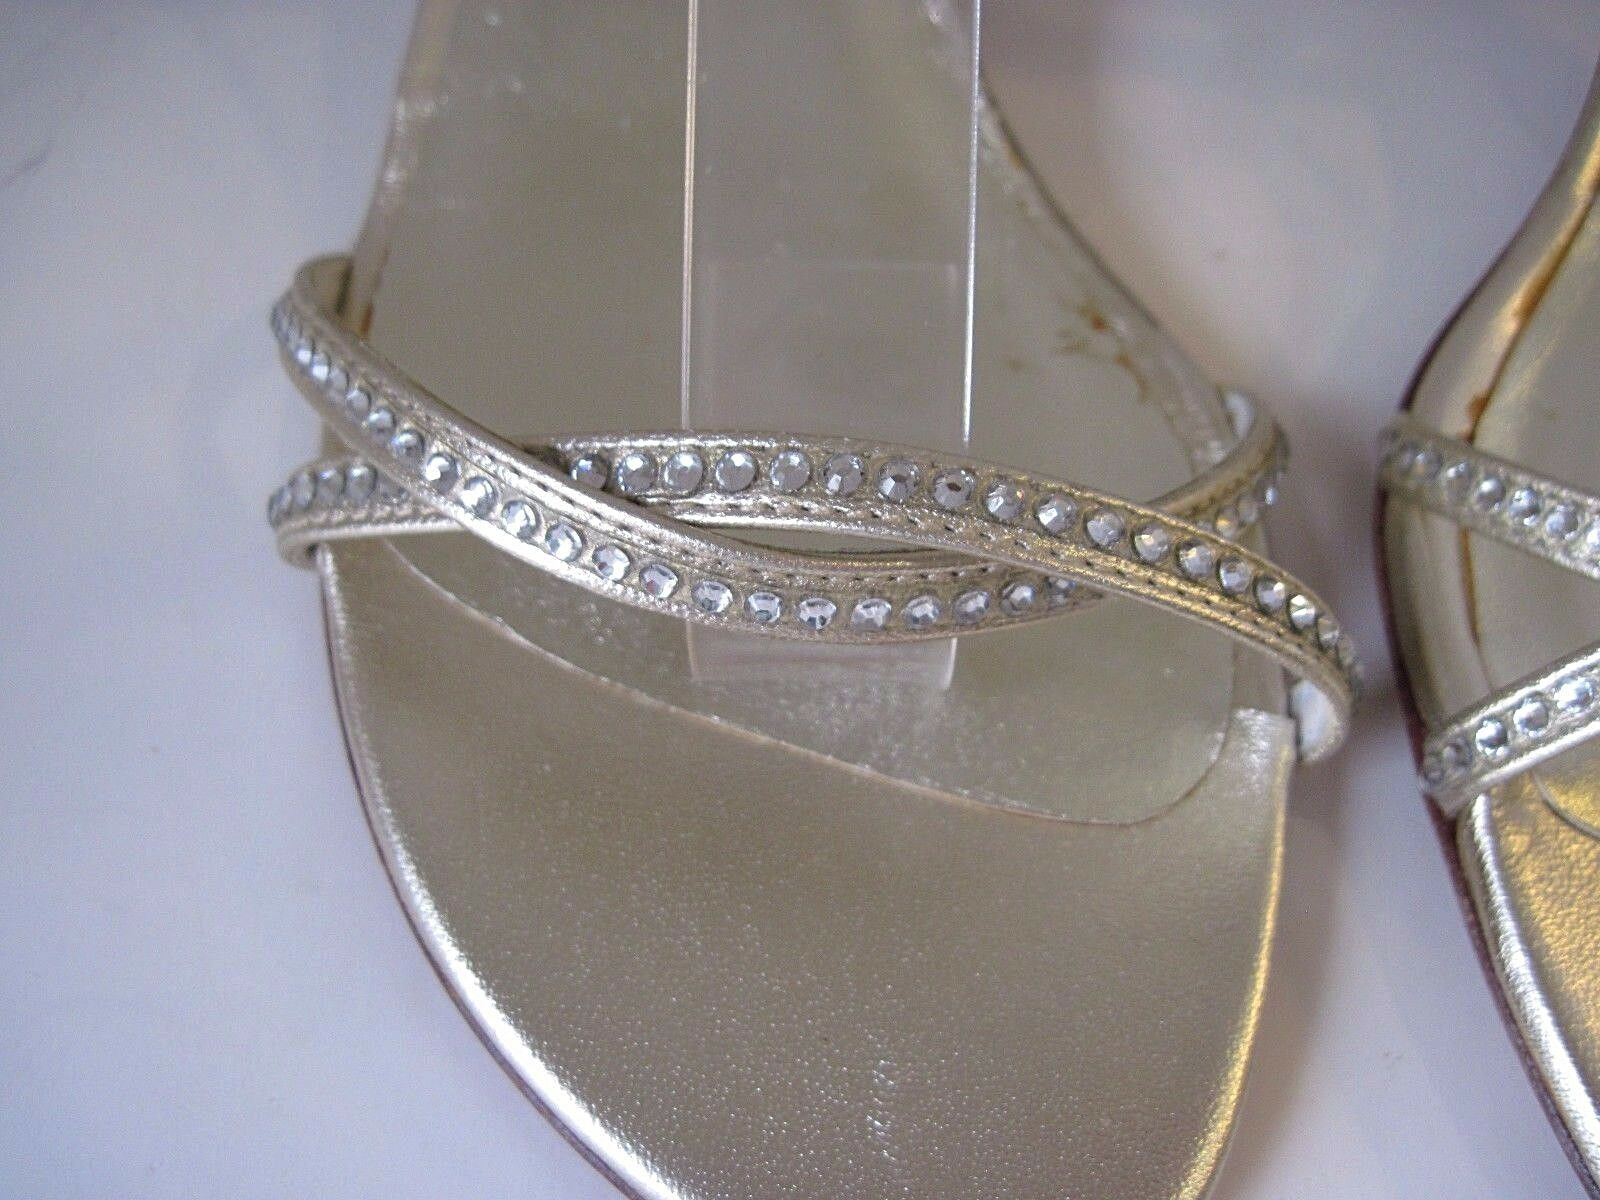 Stuart Weitzman Color Dorado Cristal Cristal Cristal De Cuero Enjoyado Charol Tacones Talla 6 1 2 M 82c365